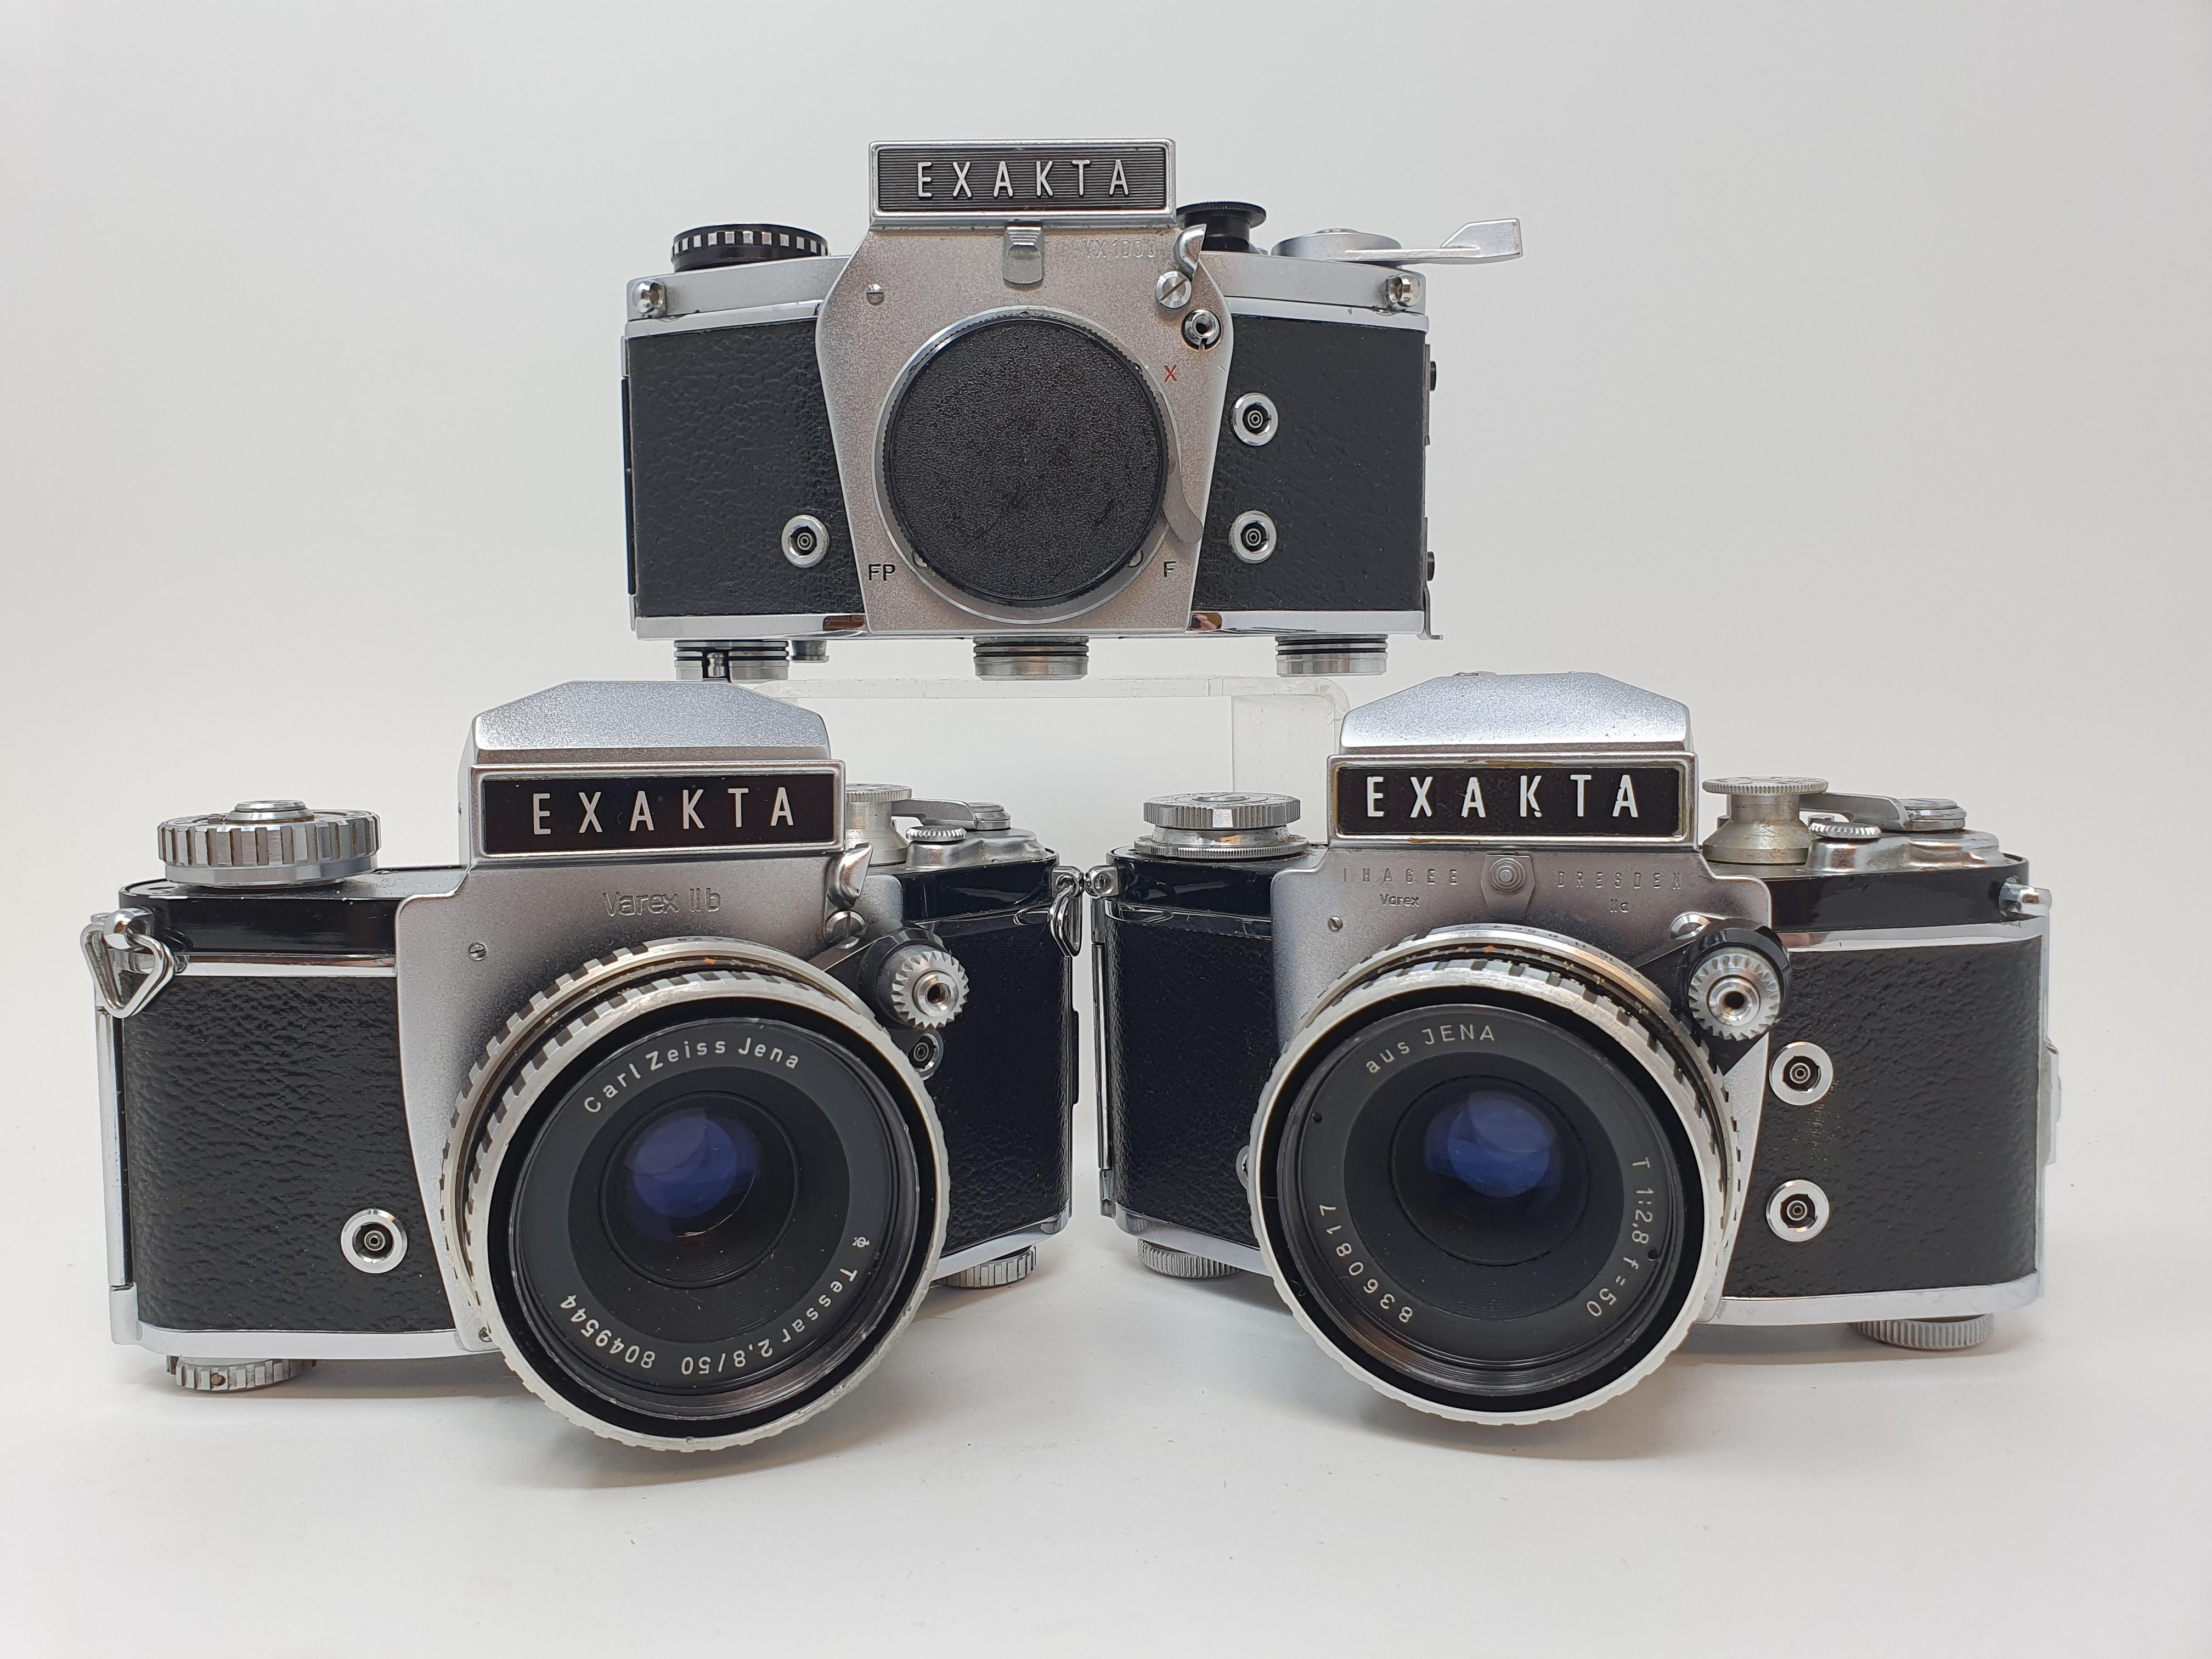 An Exakta Varex 11a camera, a VX 1000 camera body and a Varex IIb camera (3) Provenance: Part of a